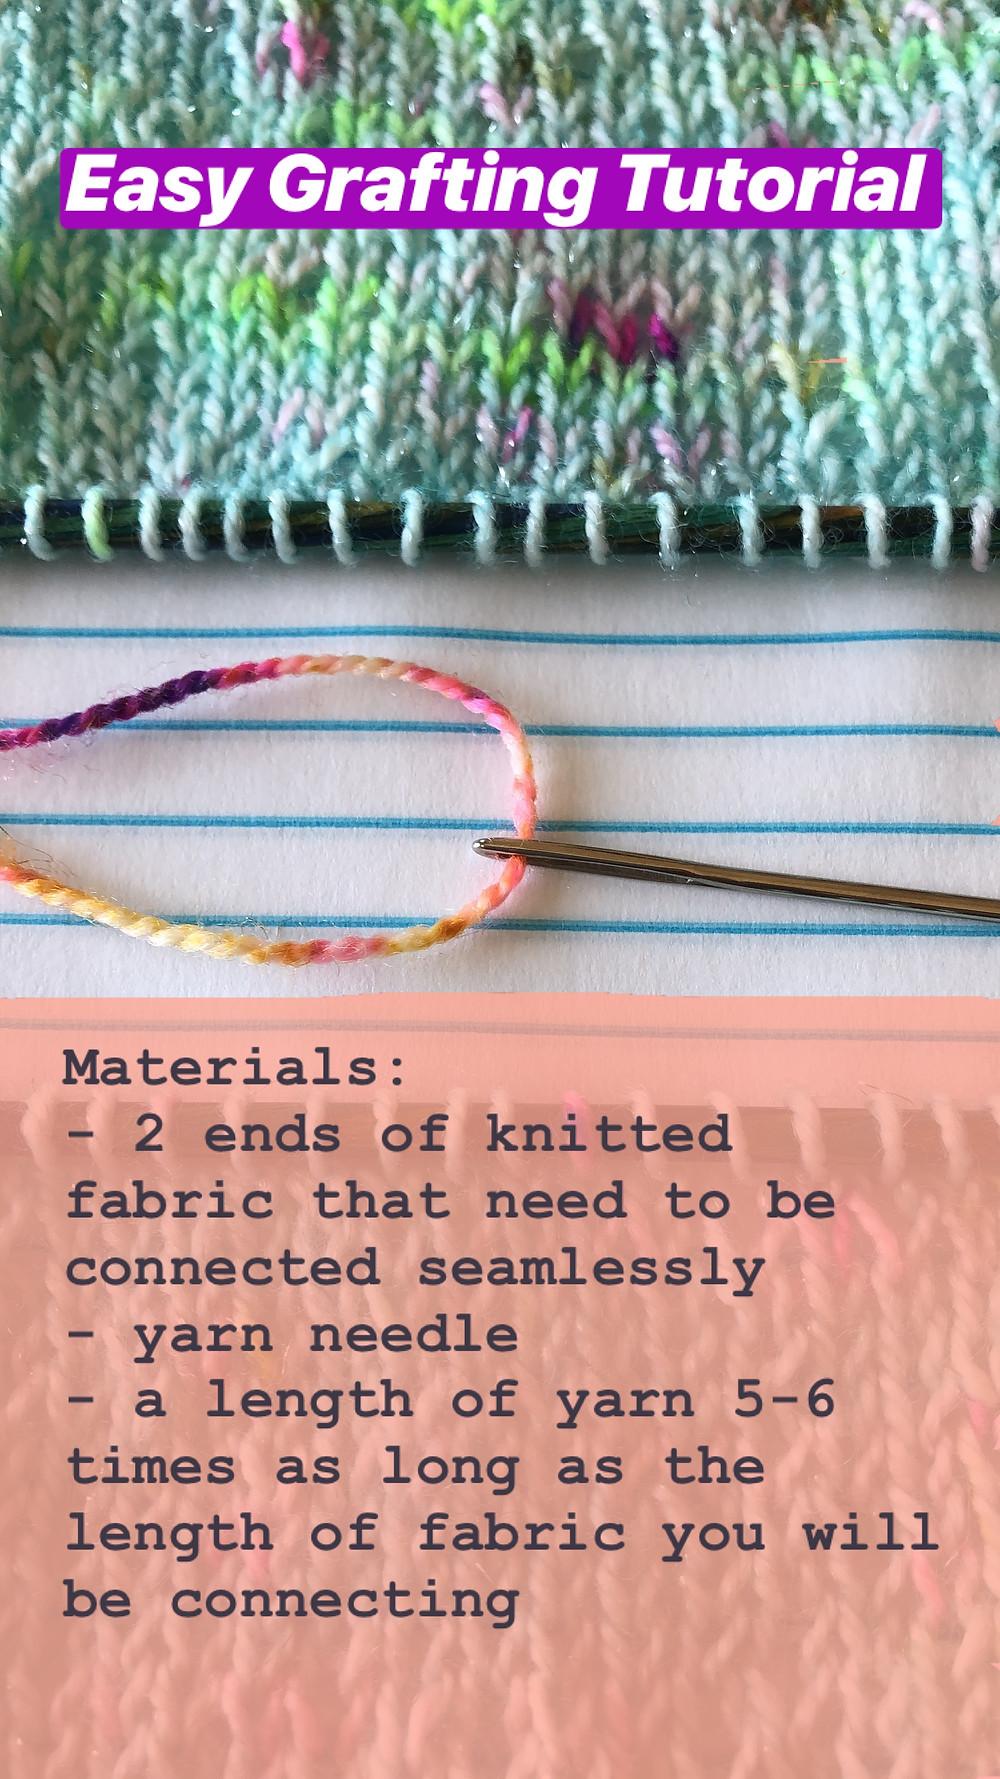 Easy Grafting / Kitchener Stitch Tutorial Materials